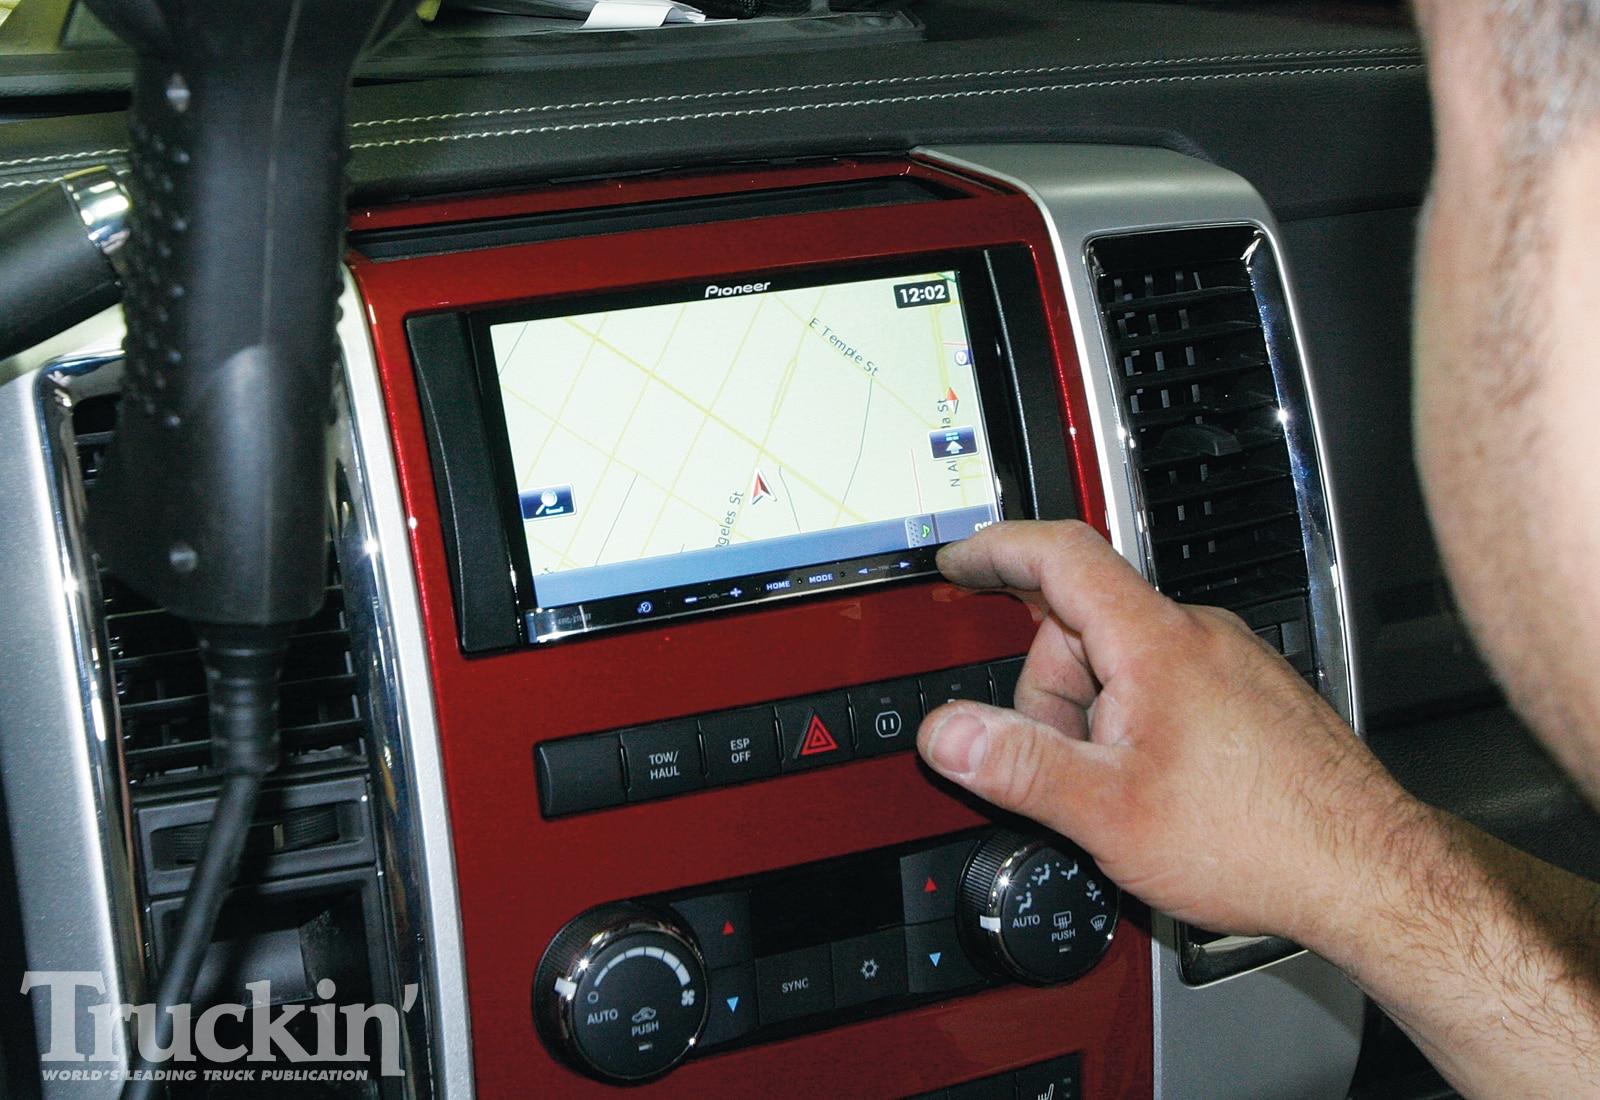 2009 Dodge Ram Audio Upgrades - Pioneer In-Dash Navigation